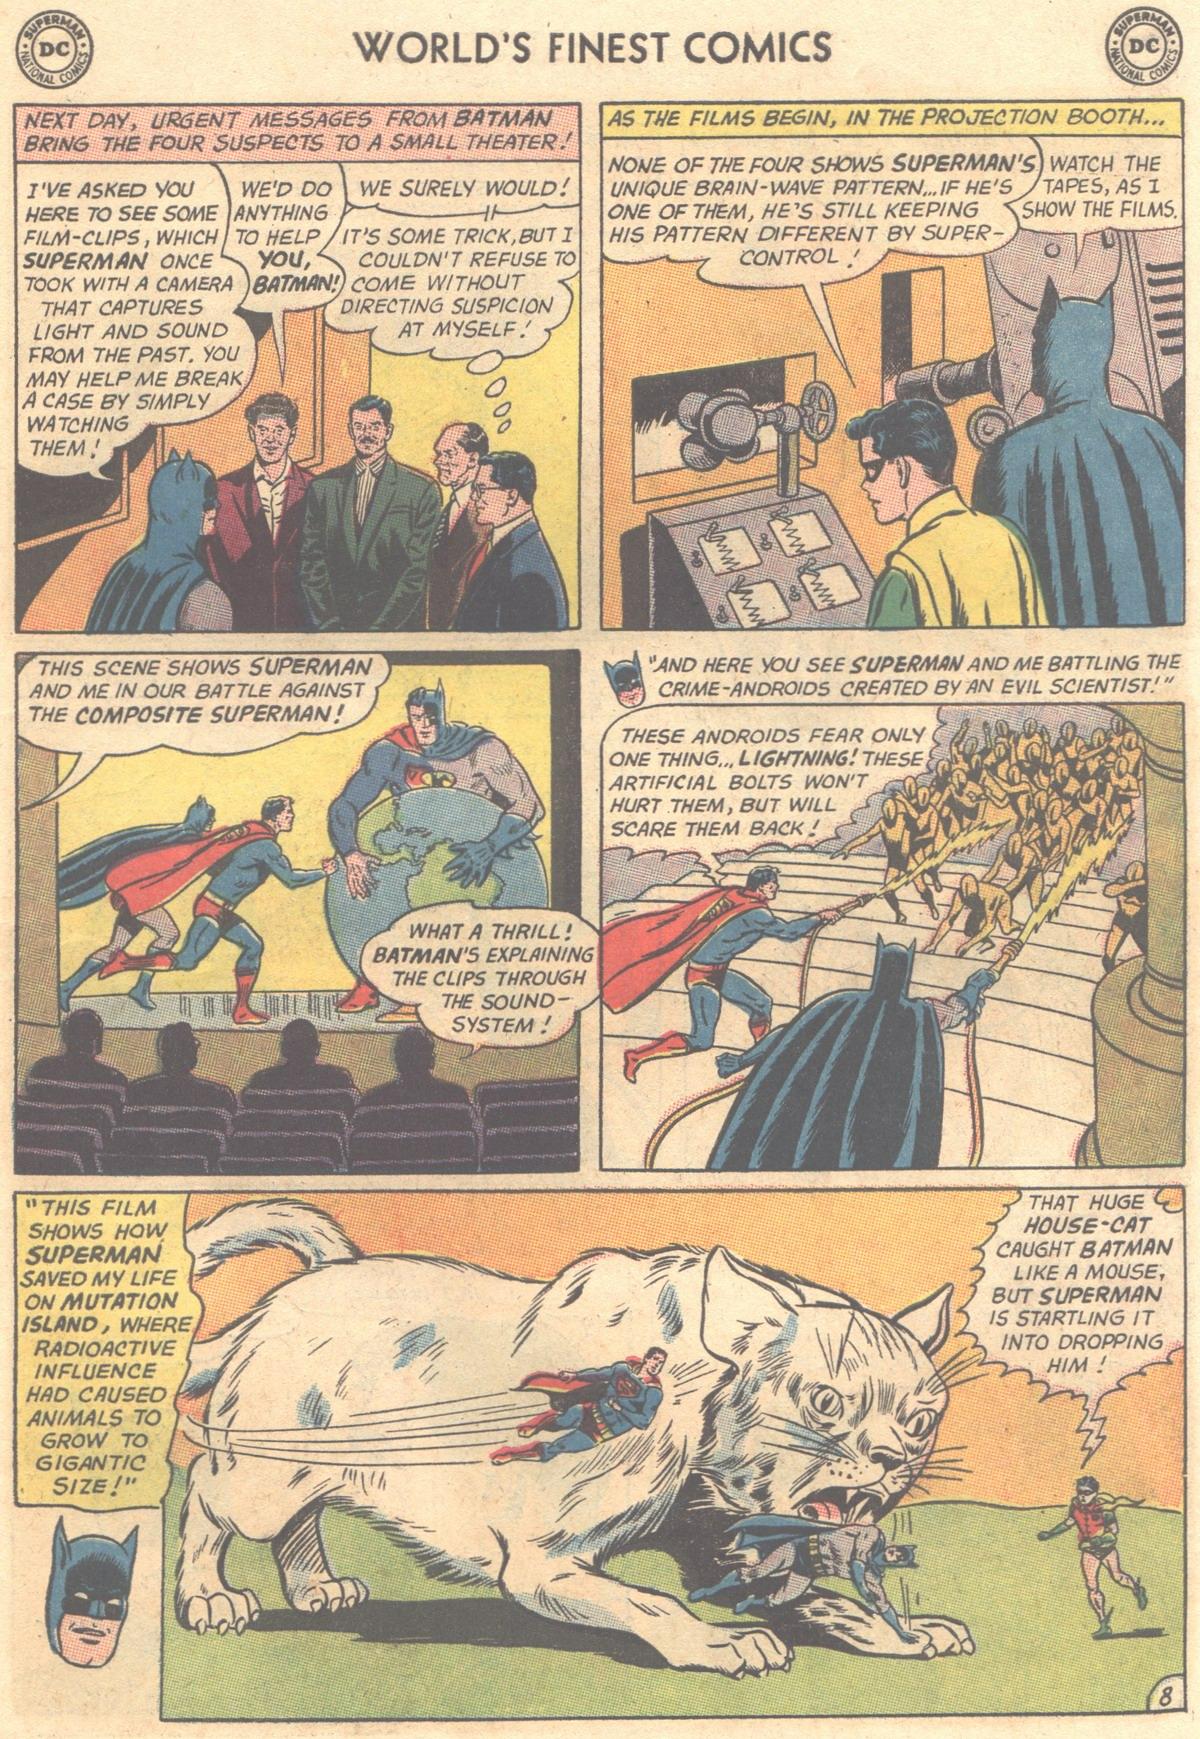 Read online World's Finest Comics comic -  Issue #149 - 11